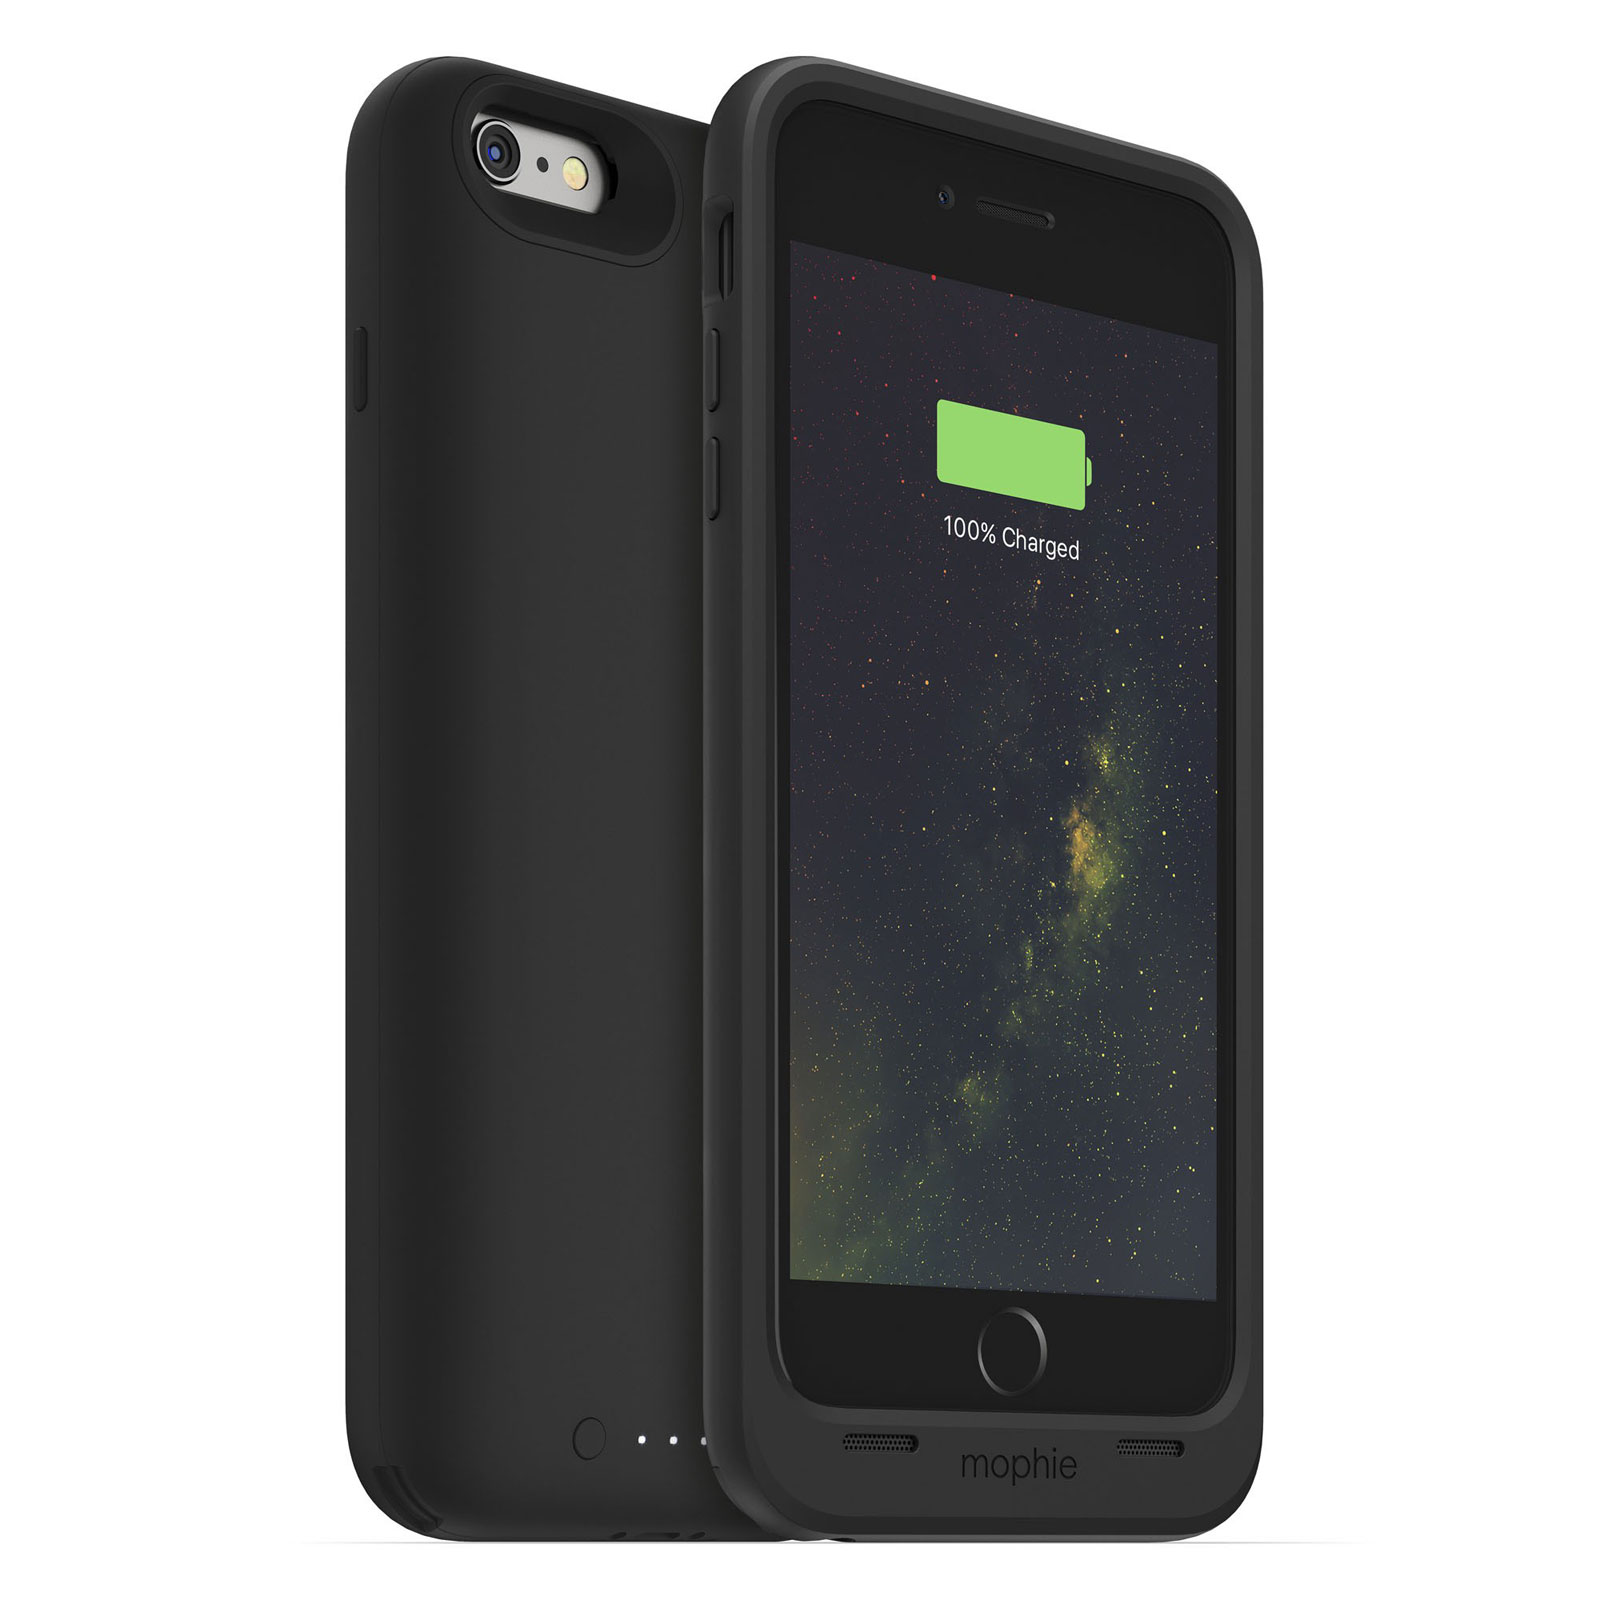 mophie juice pack wireless charging base noir iphone 6 plus 6s plus etui t l phone mophie. Black Bedroom Furniture Sets. Home Design Ideas